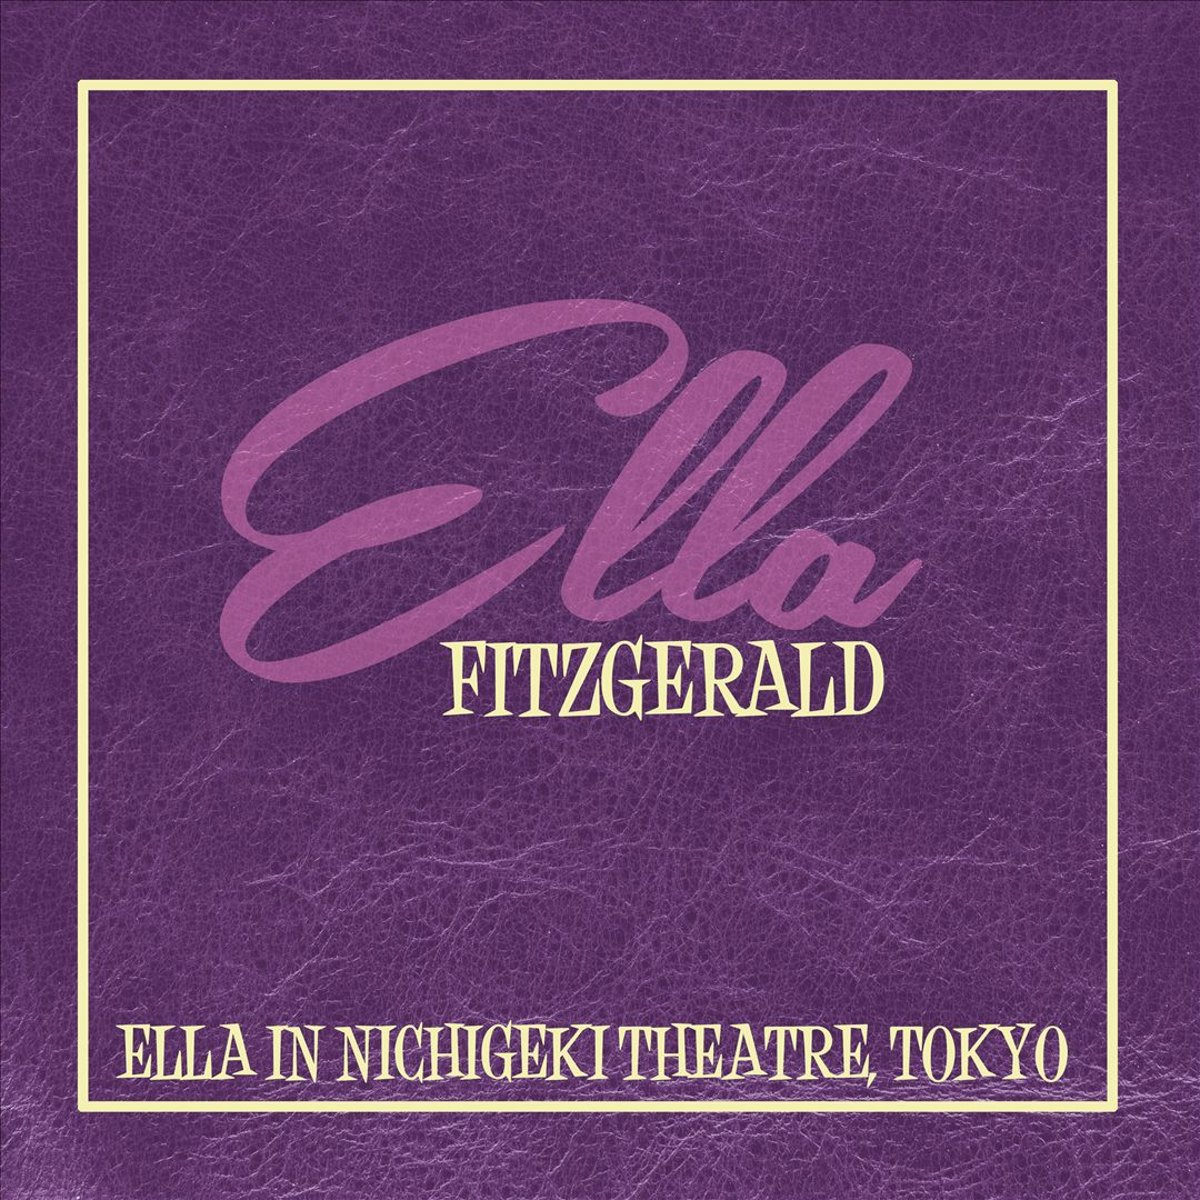 Элла Фитцжеральд Ella Fitzgerald. Ella In Nichigeki Theatre, Tok (LP) сабо ella ella el023awebb89